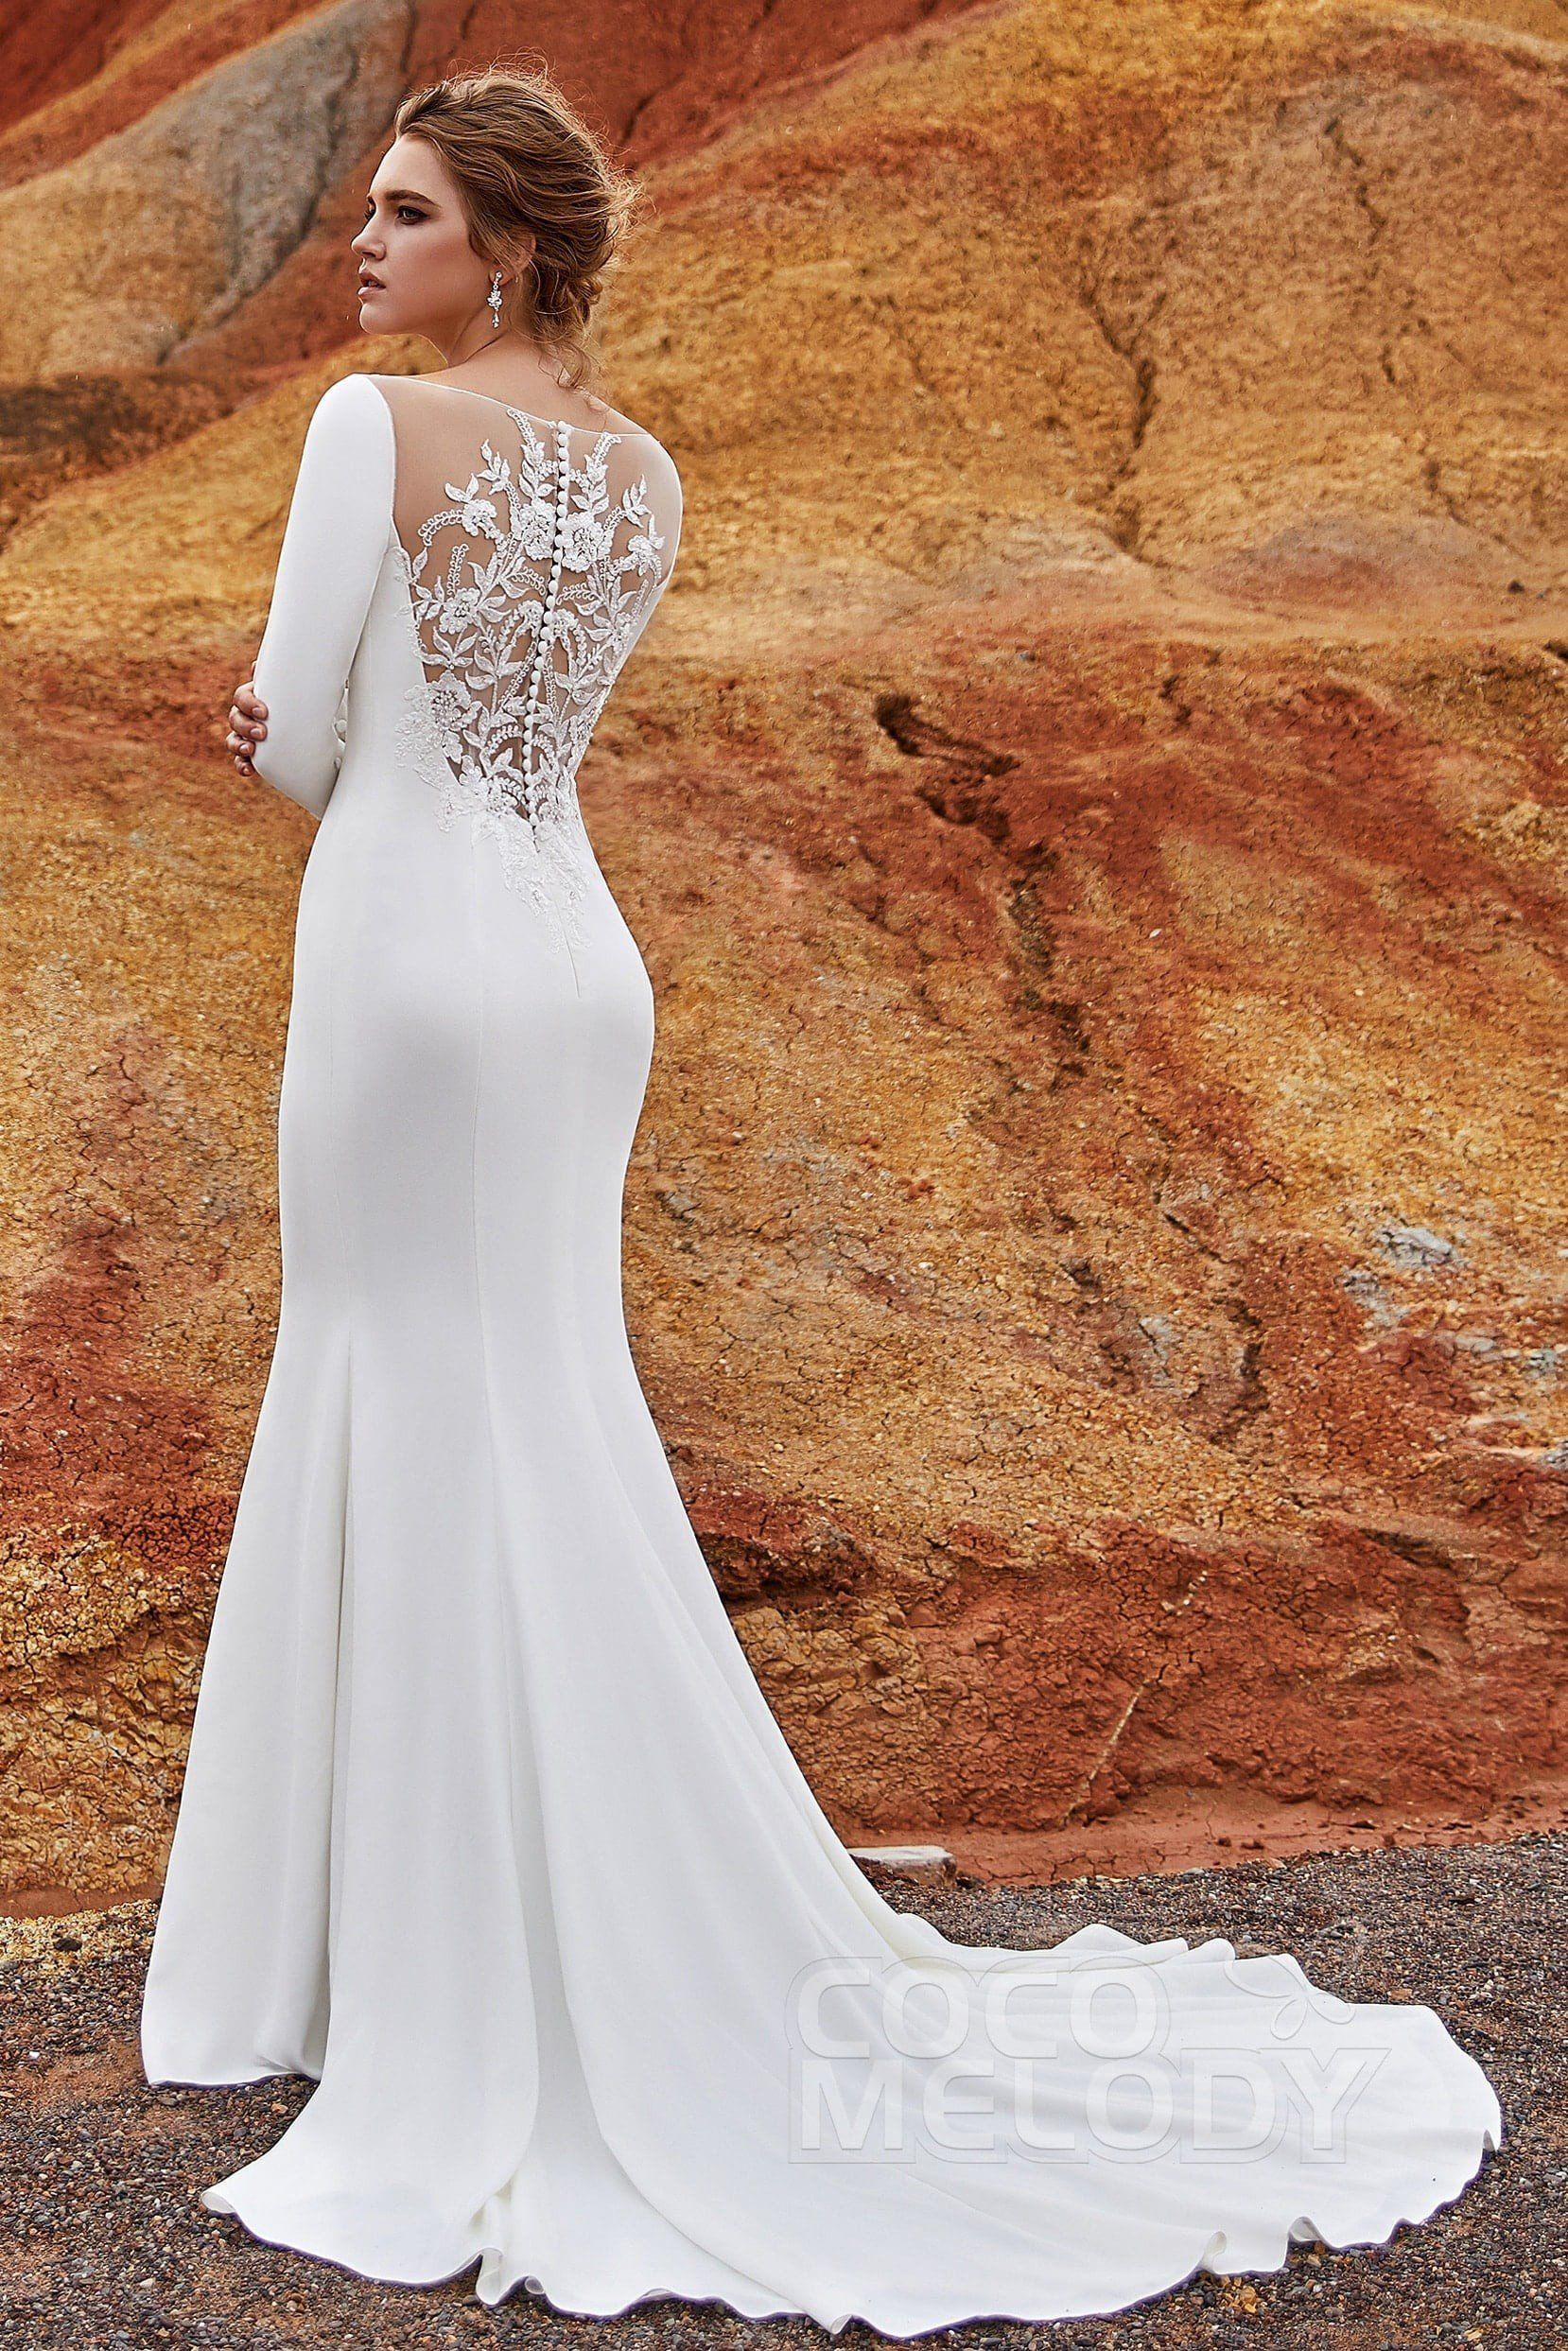 Usd 799 Trumpet Mermaid Bateau Knitted Fabric Wedding Dress Ld5817 Wedding Dresses Wedding Dresses Simple Wedding Dress Long Sleeve [ 2486 x 1658 Pixel ]